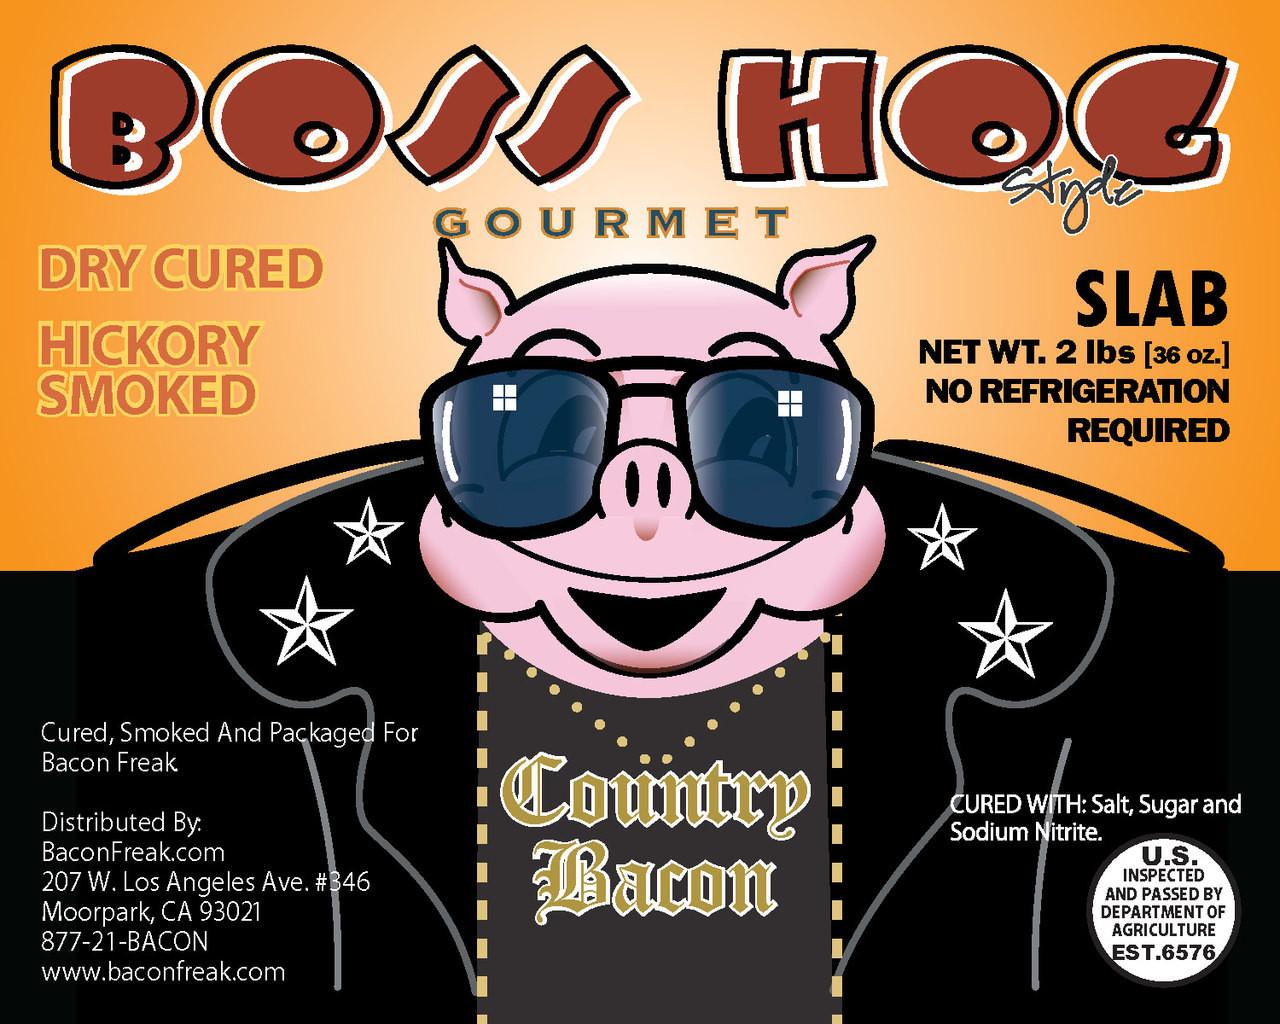 Boss Hog Hickory Smoked Unsliced Slab Bacon - 2 Pounds